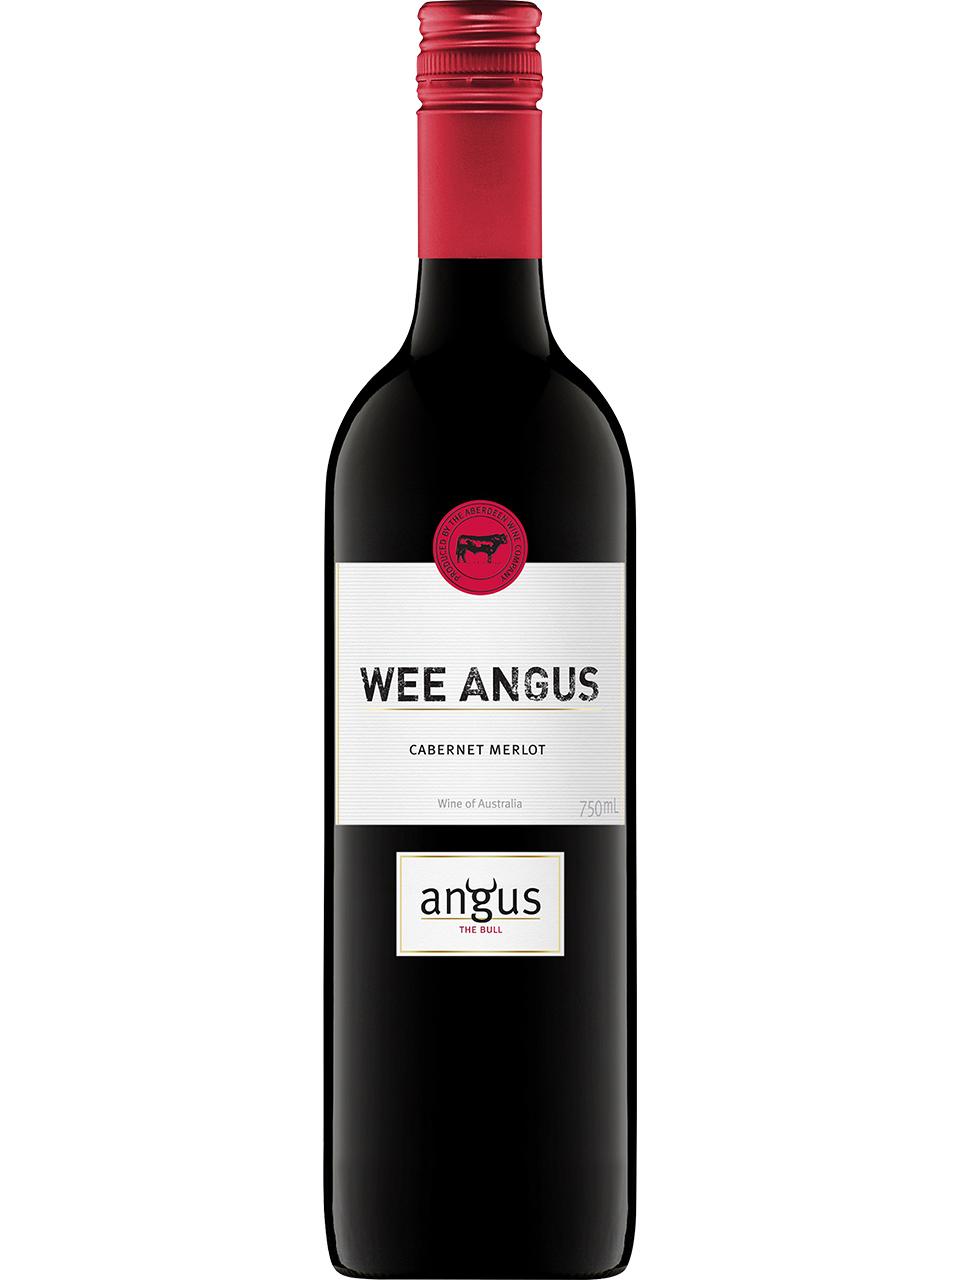 Wee Angus Cabernet Merlot